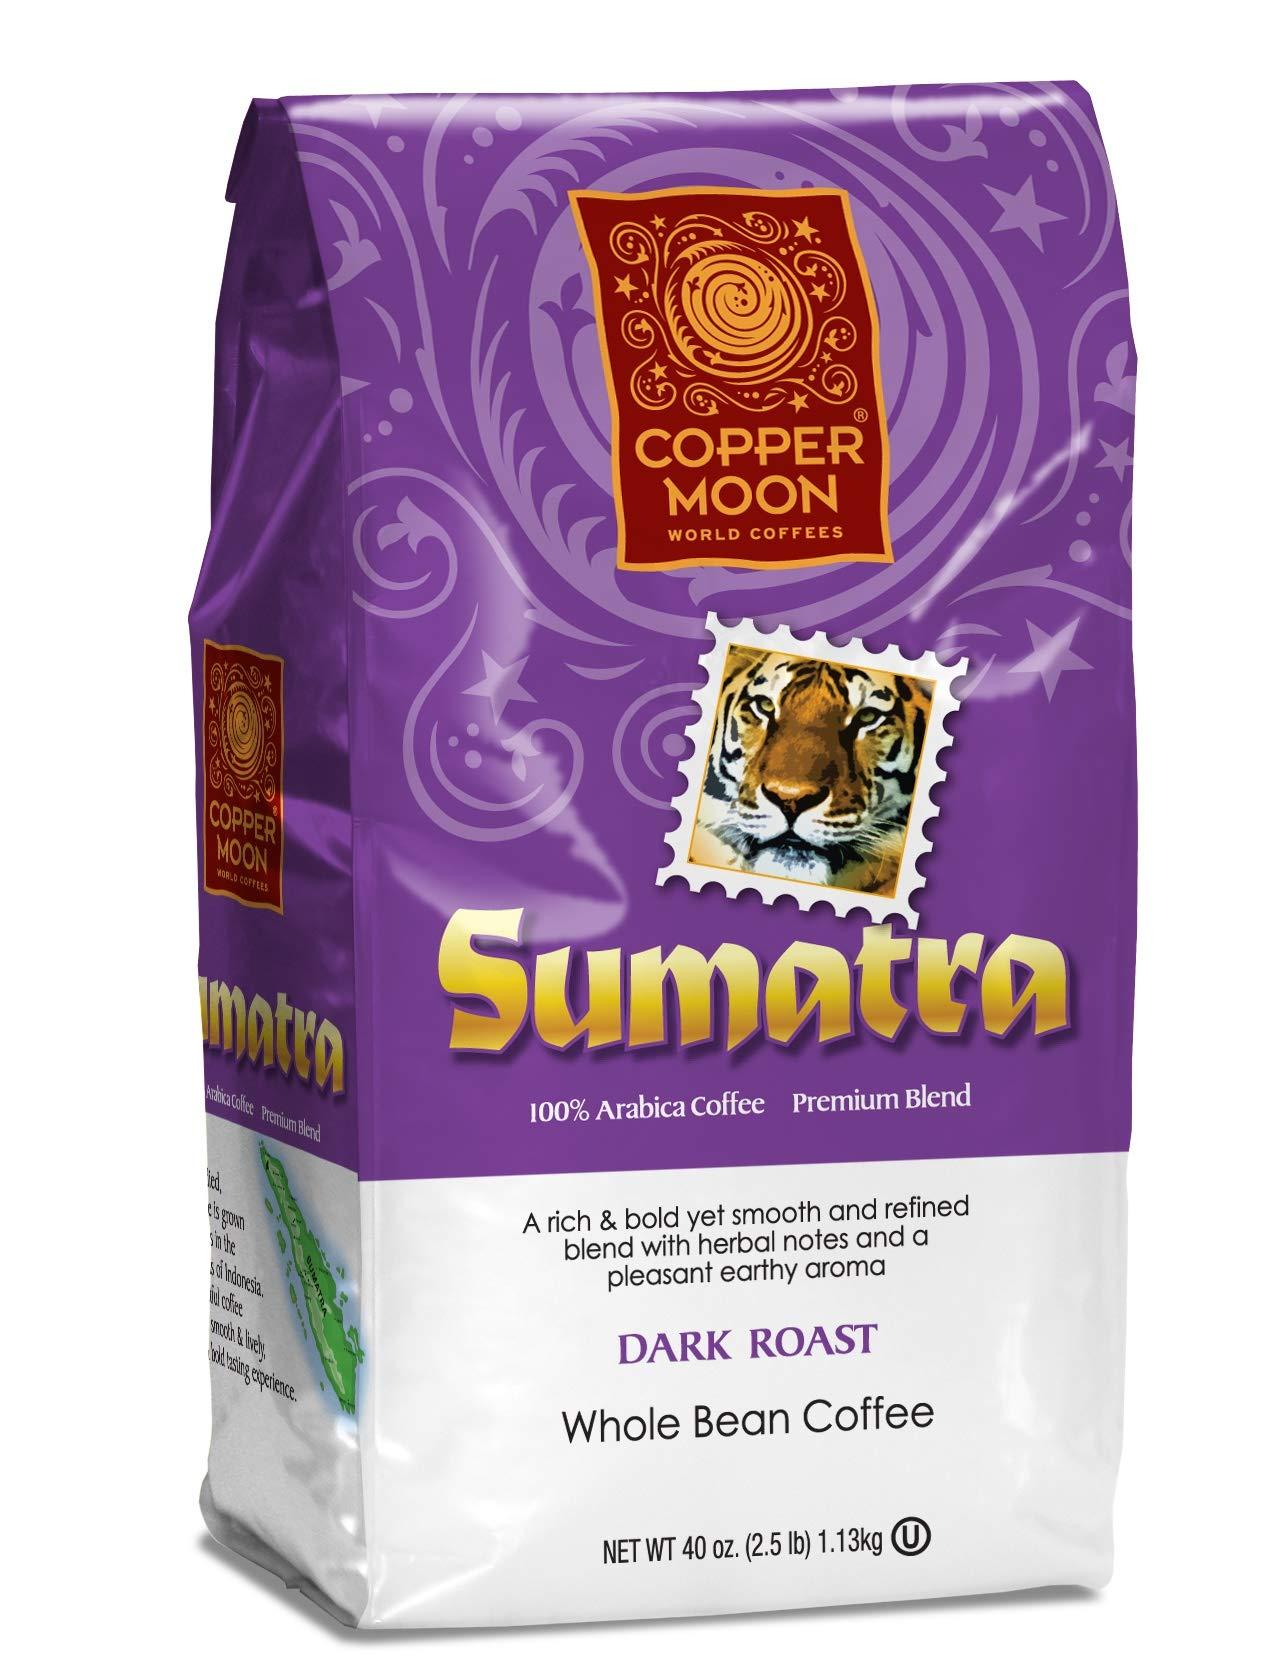 Copper Moon Coffee Sumatra Blend 2.5 pound Whole Bean